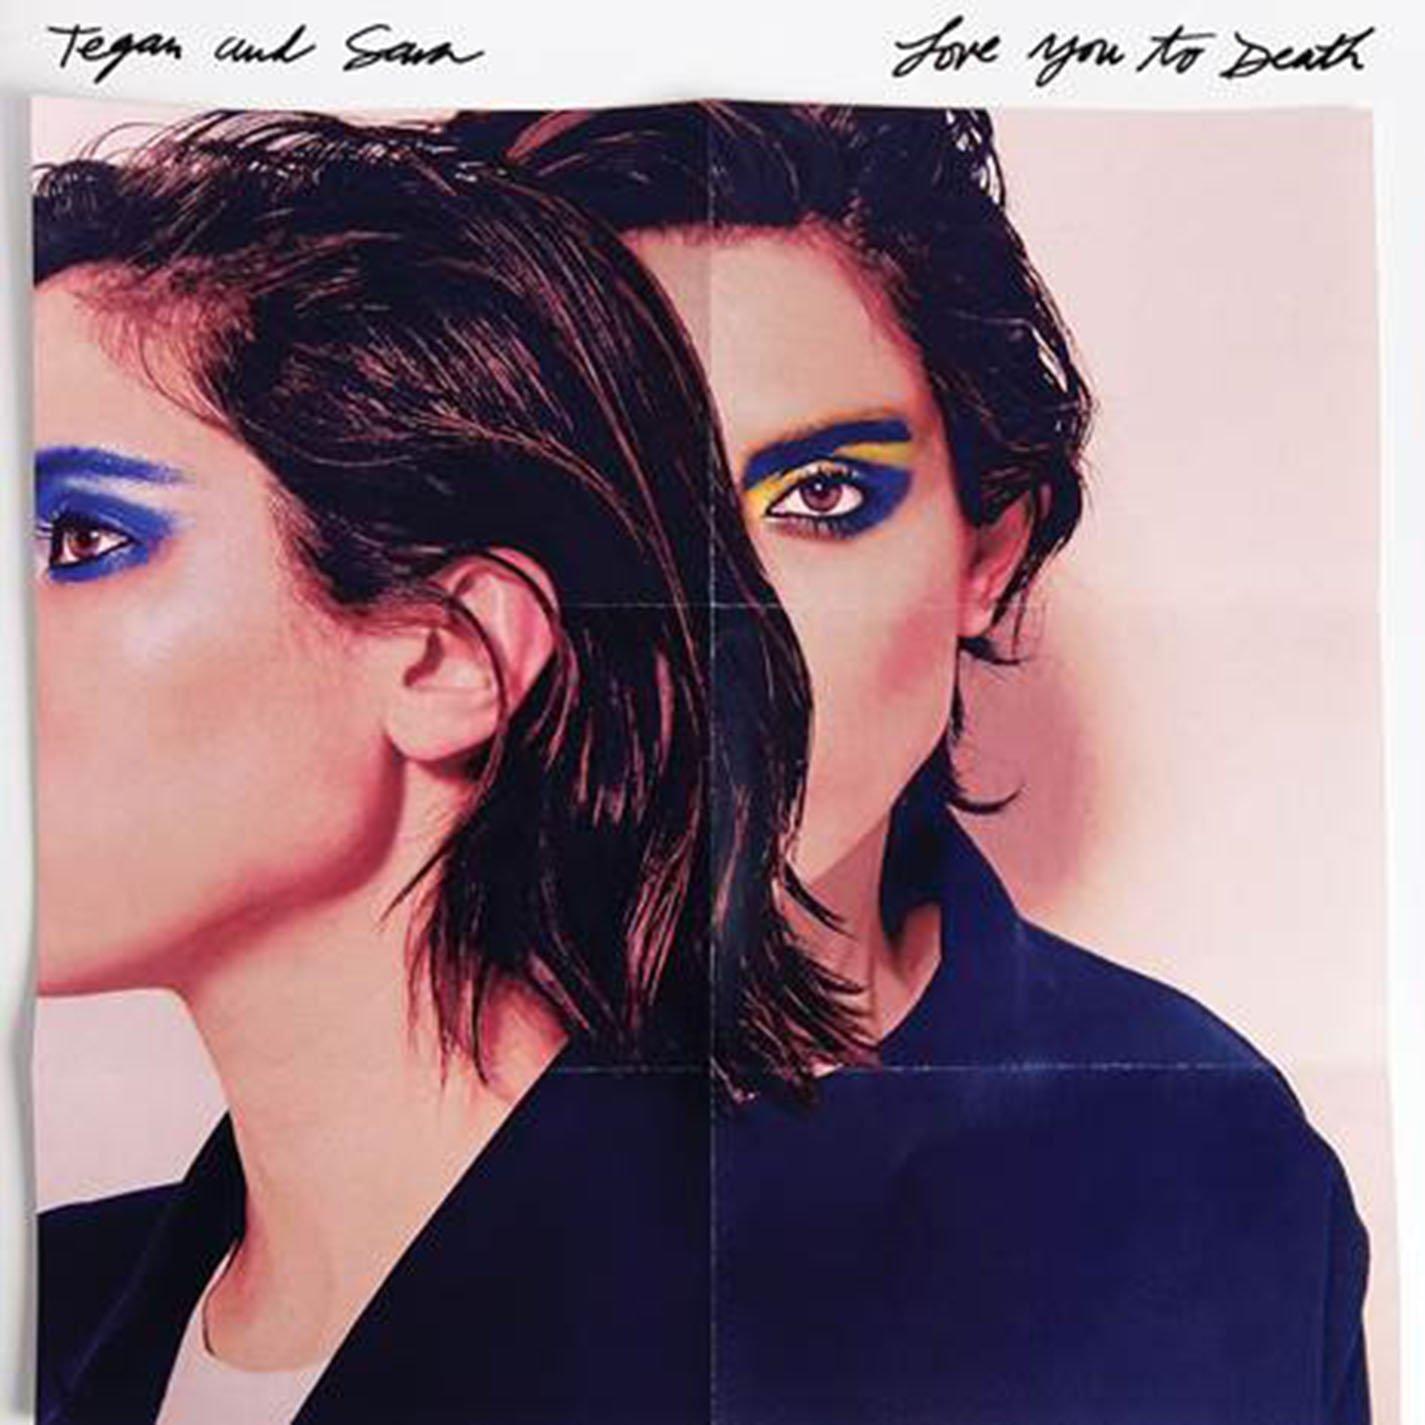 Tegan & Sara – Love You To Death [Warner Bros]